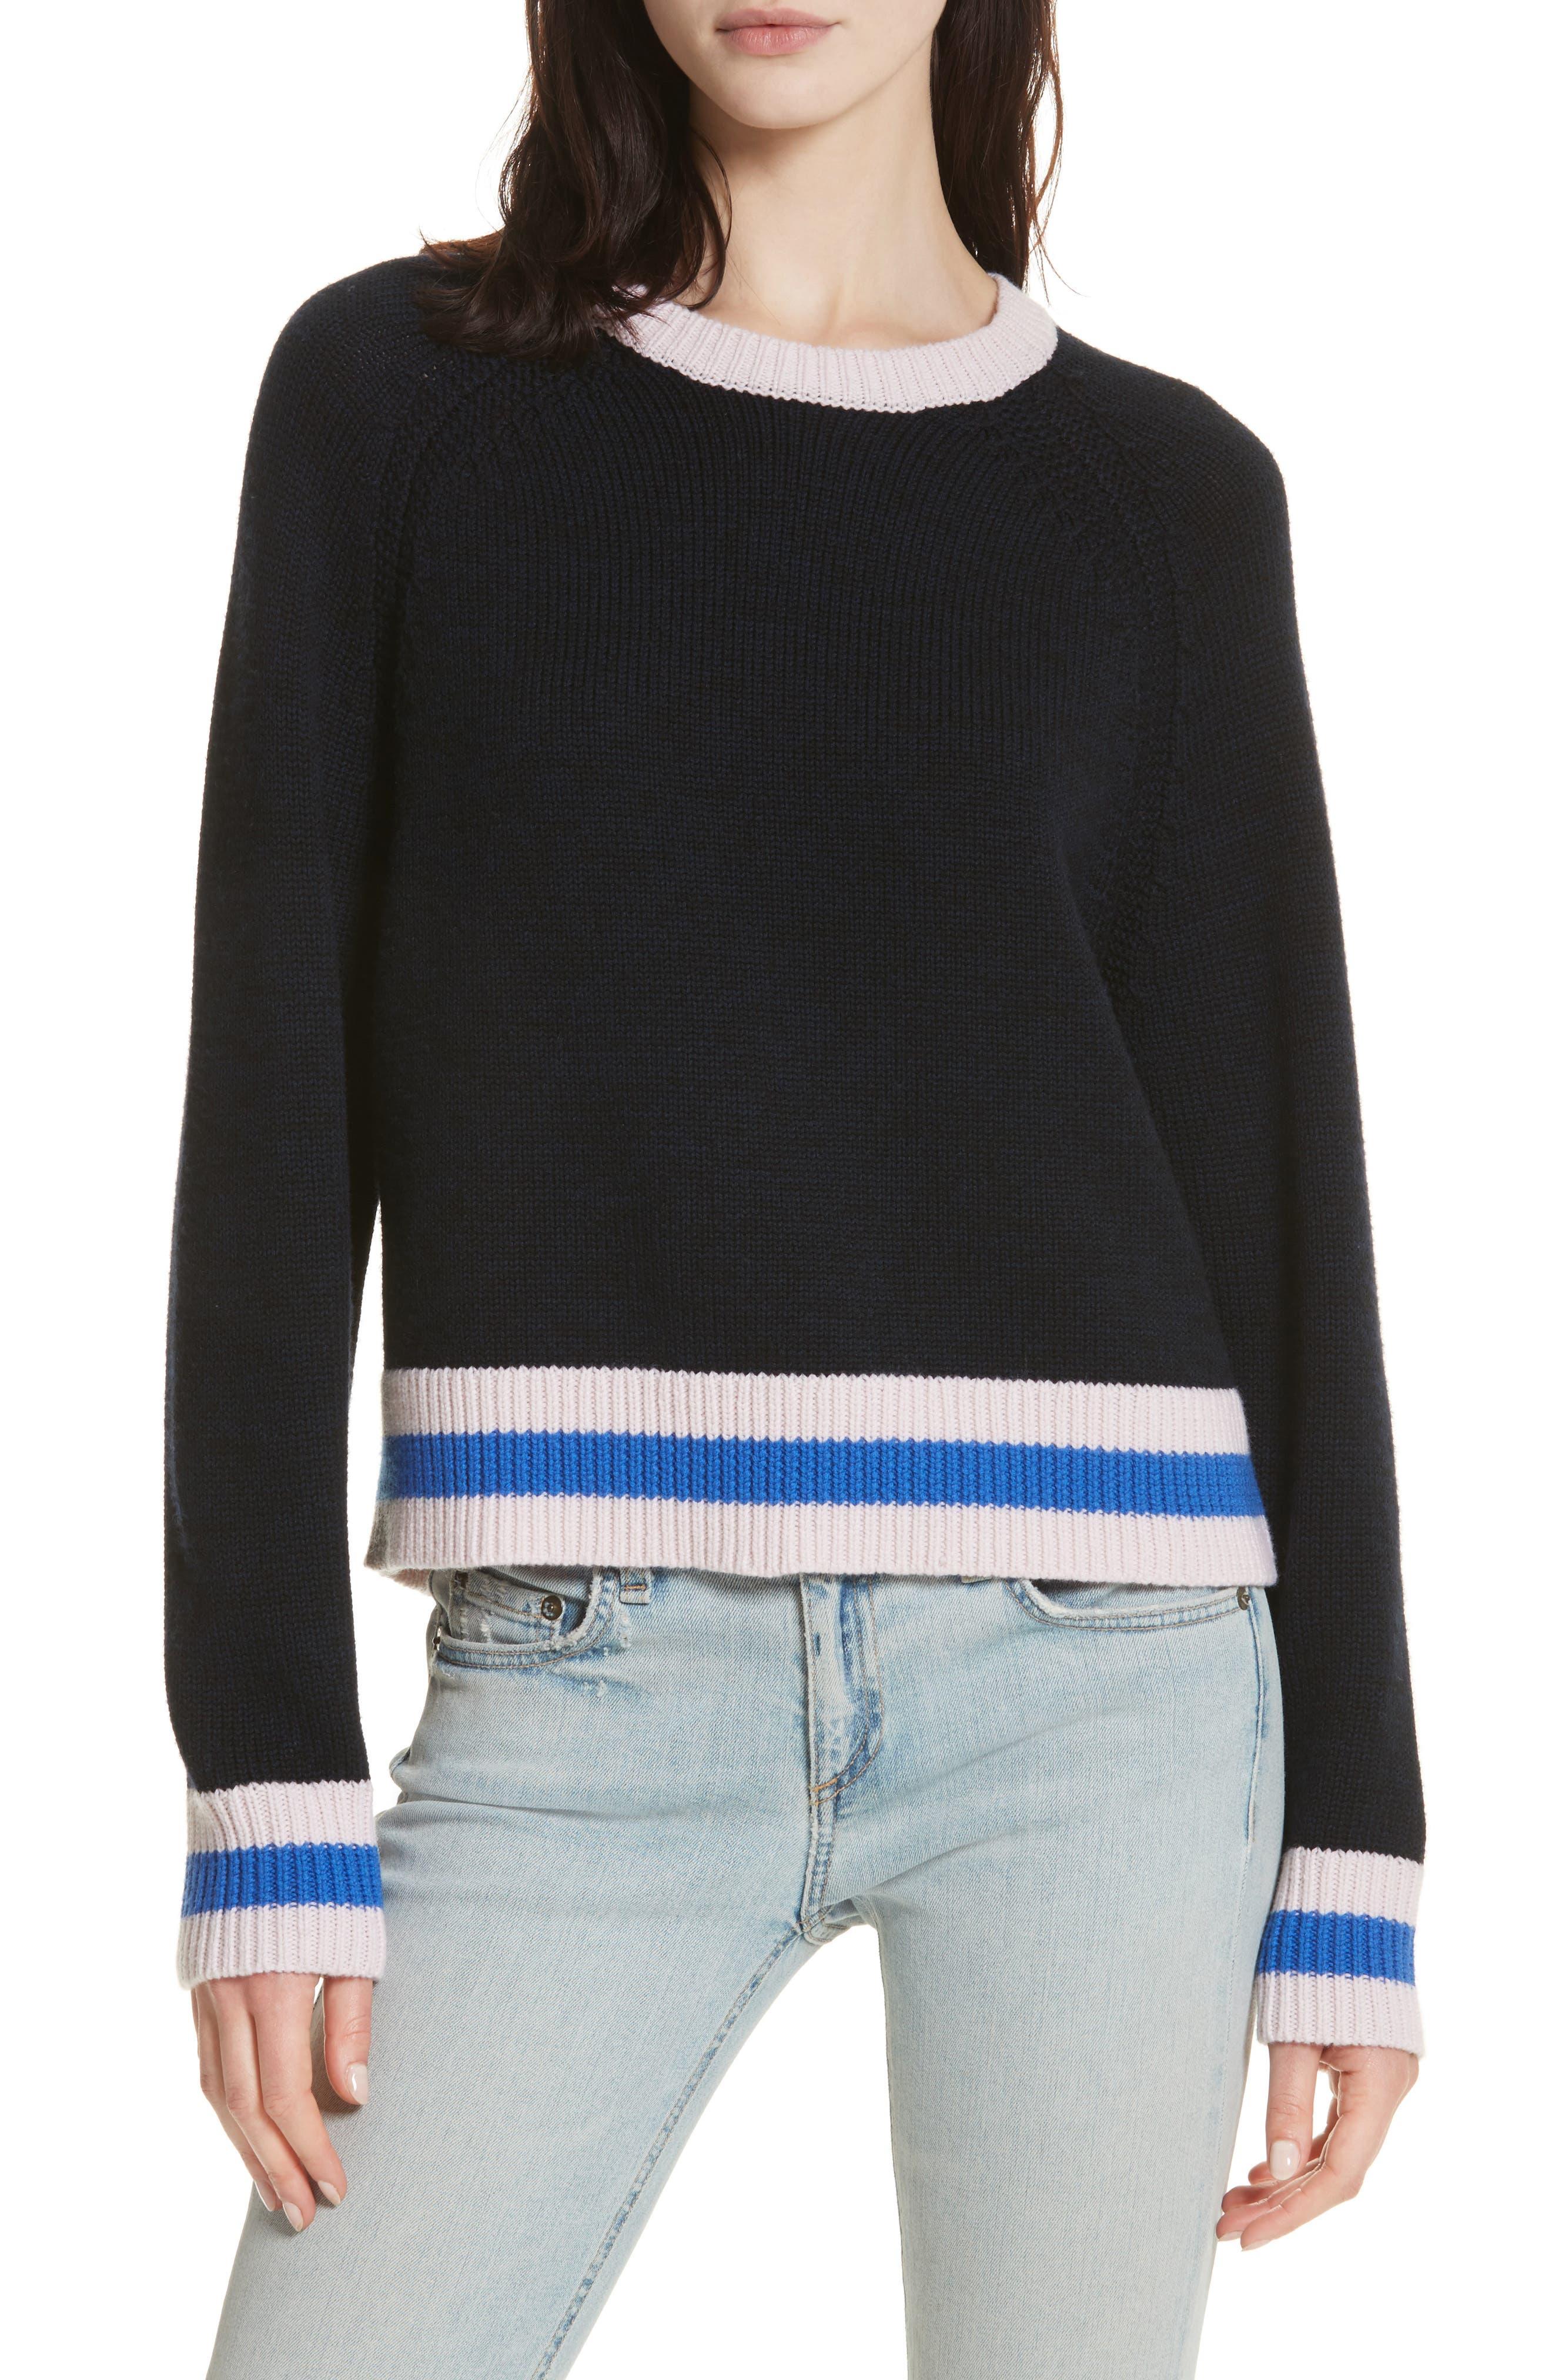 Hattie Crewneck Merino Wool Sweater,                             Main thumbnail 1, color,                             Navy